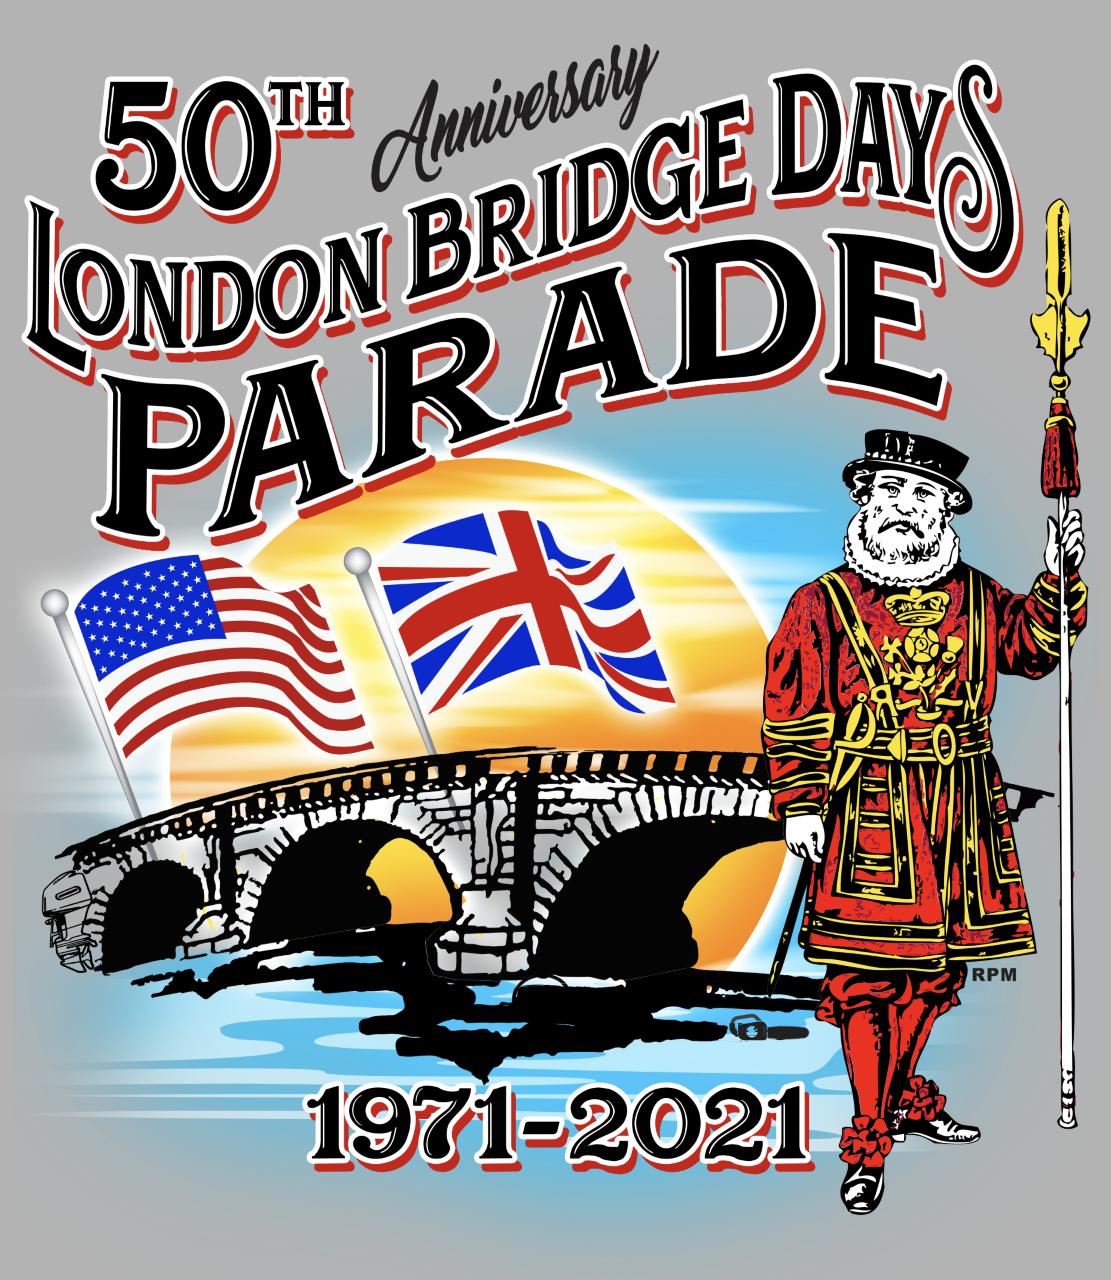 Registration Open For 50th London Bridge Days Parade